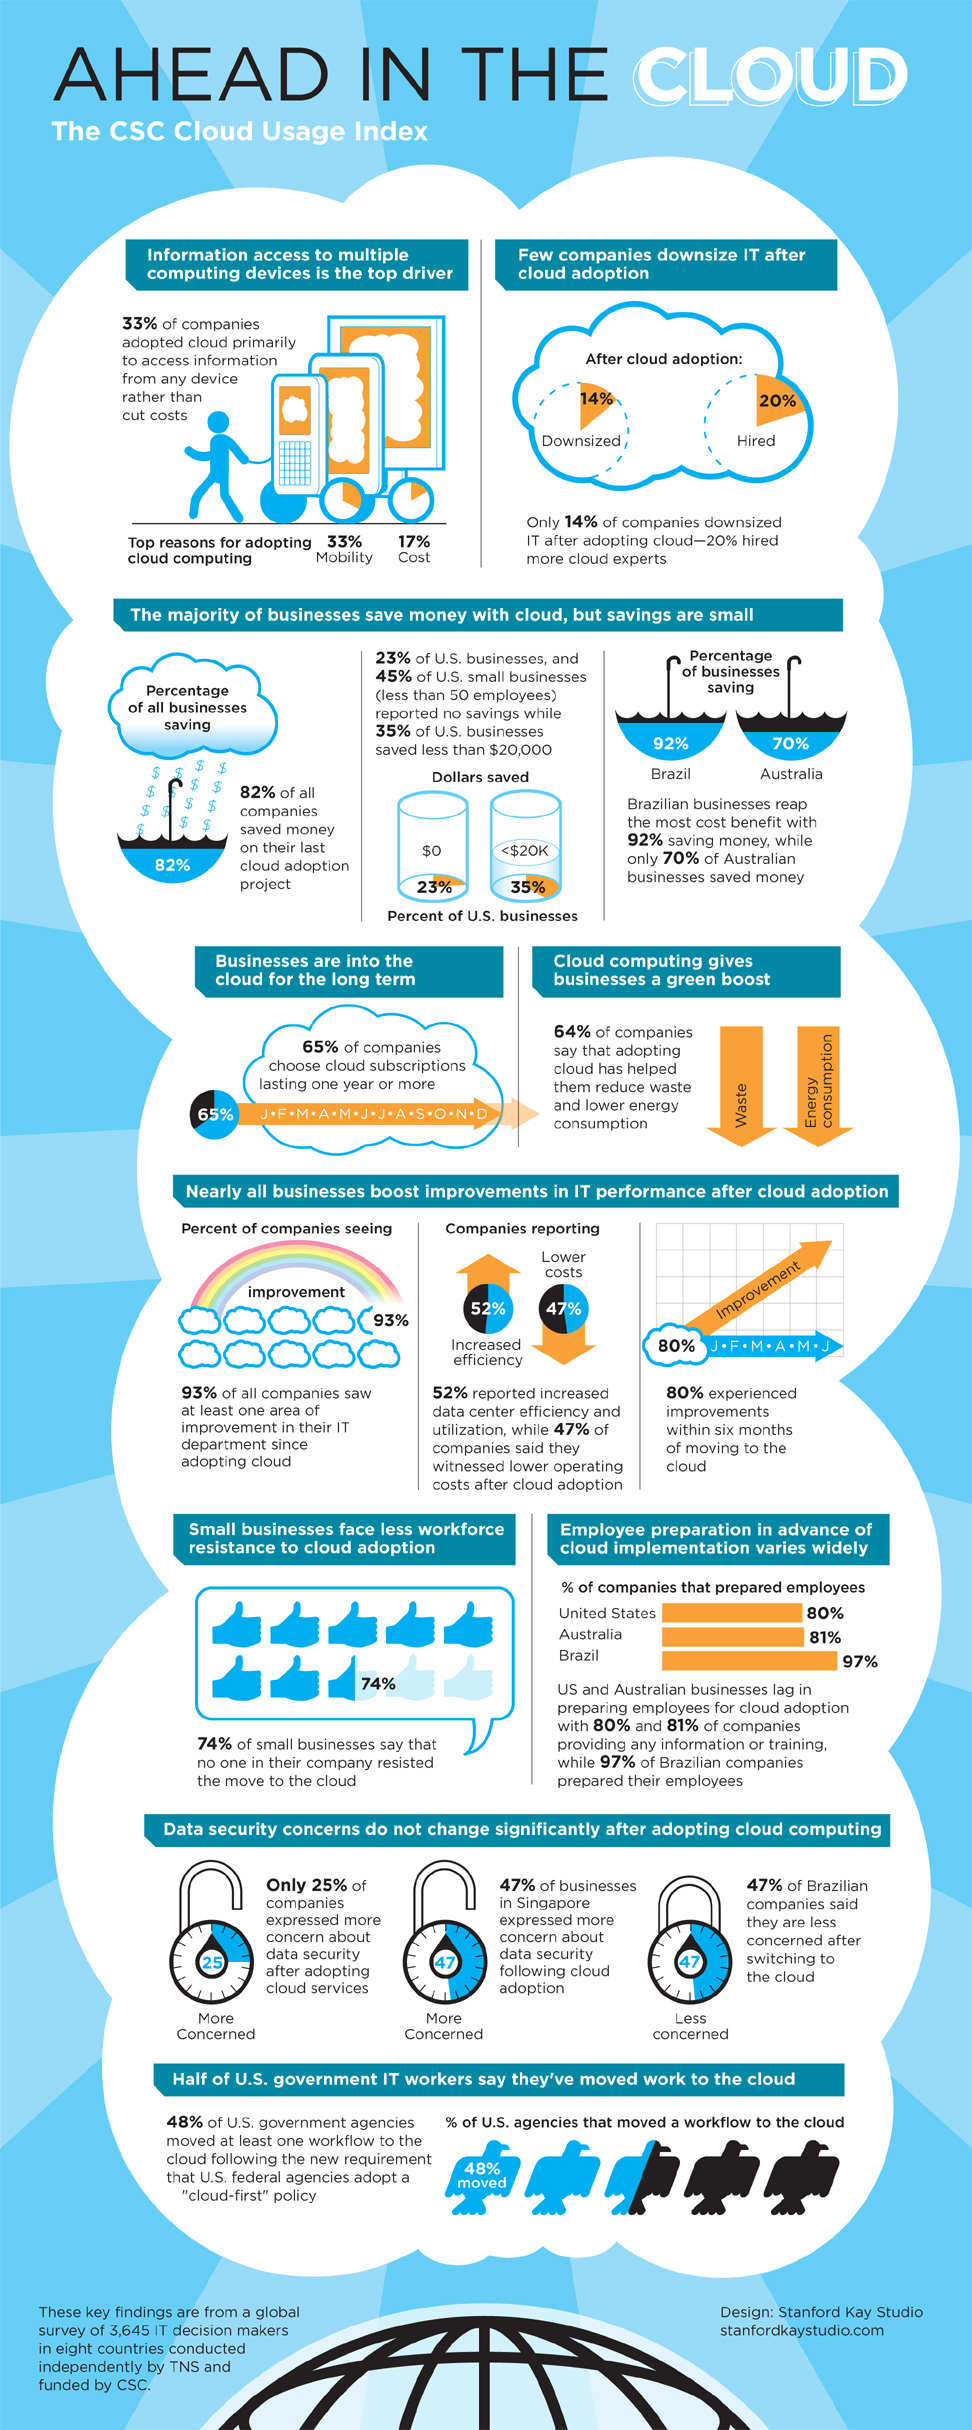 csc-cloud-index-infographic-972.jpg